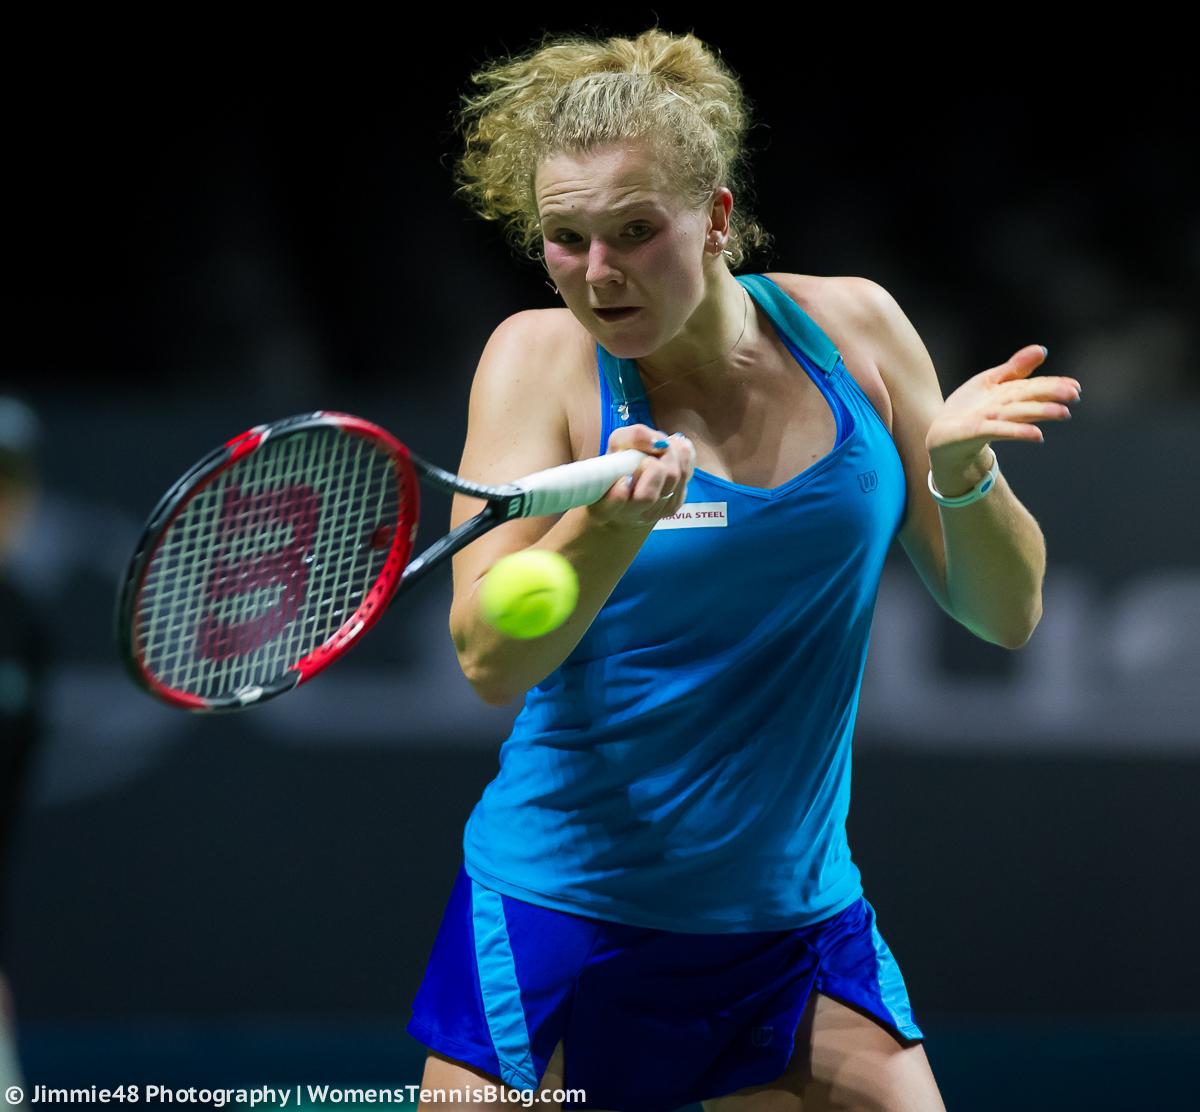 Wta: The WTA Returns To Antwerp